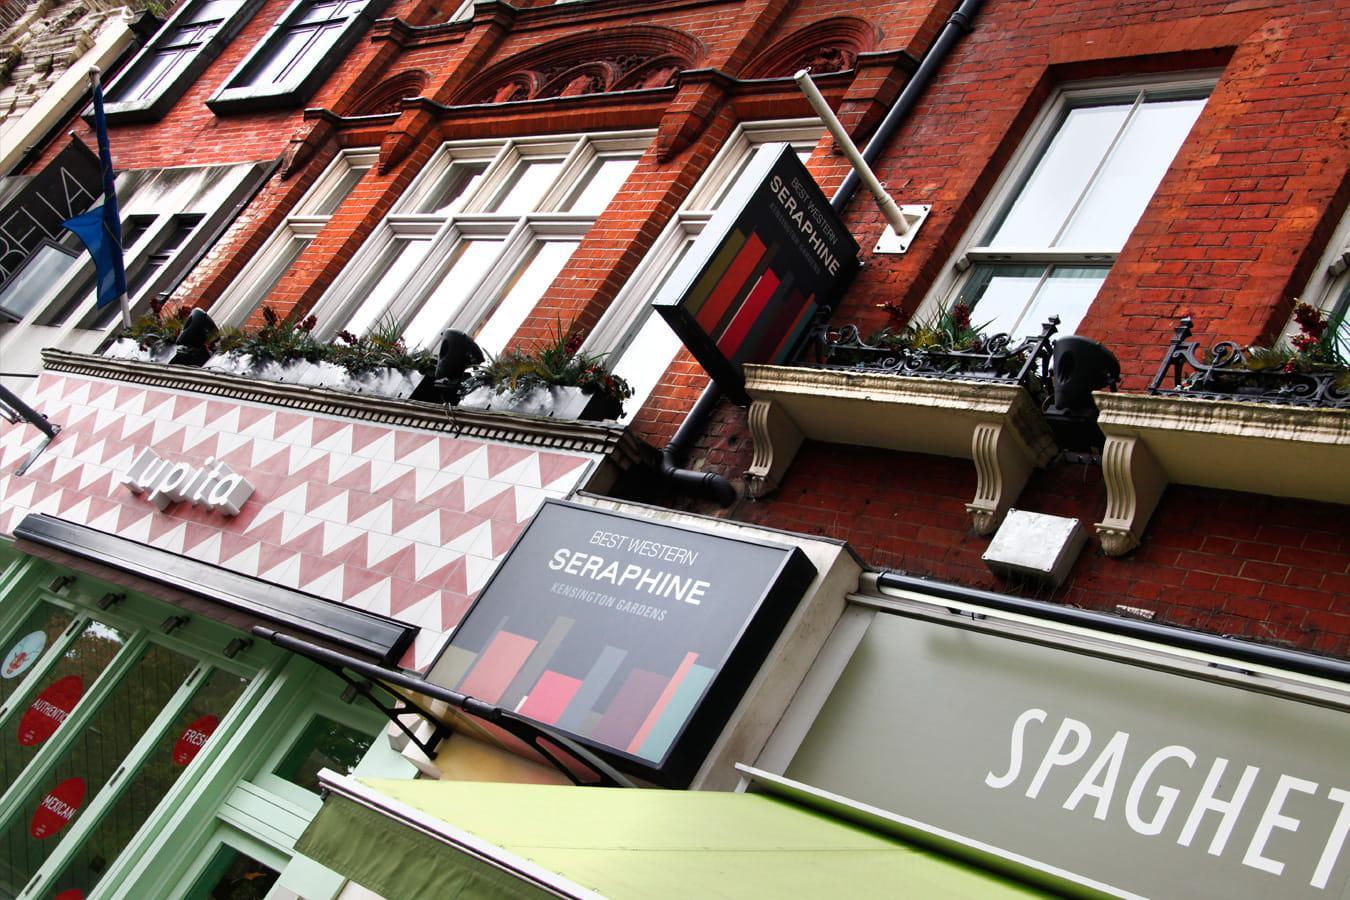 Seraphine - Kensington Gardens Hotel